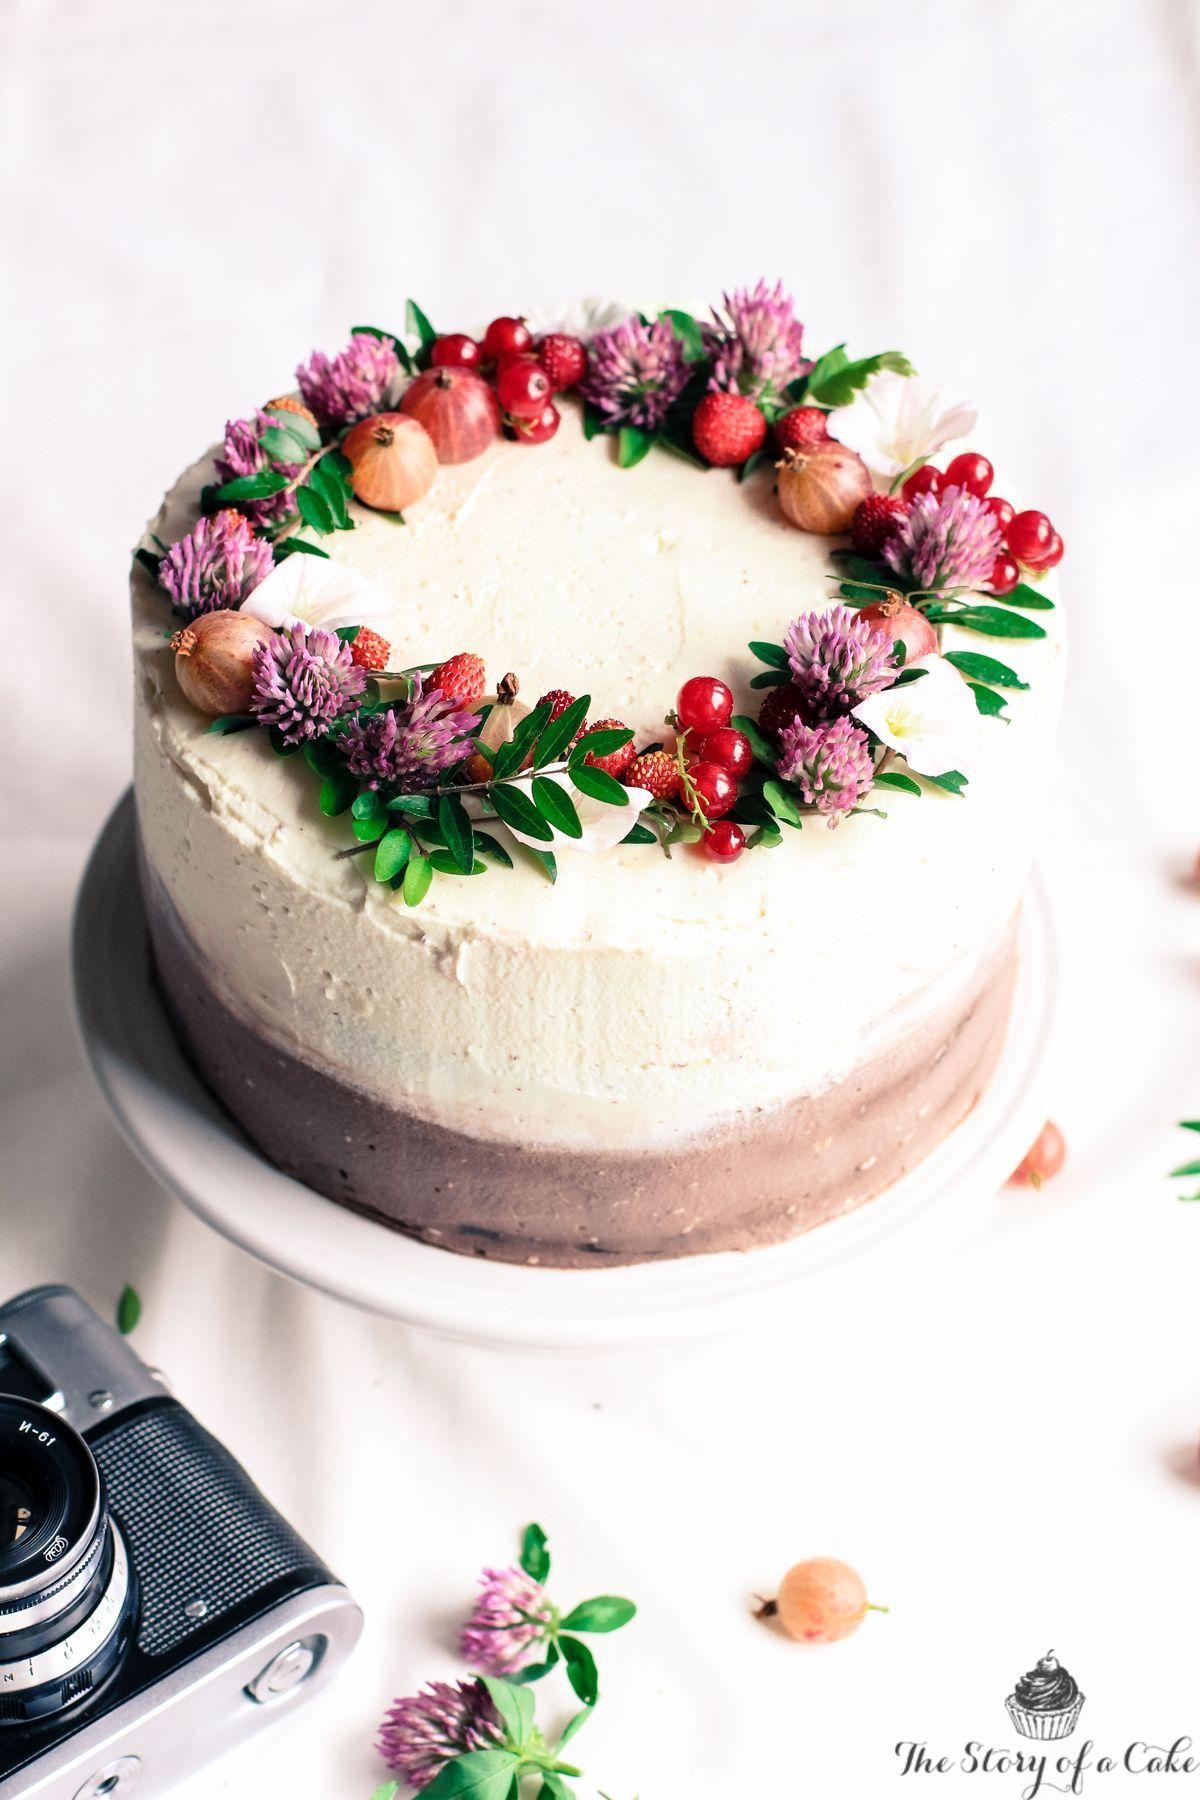 Pin by Modest Muslimah on Baking | Pinterest | Cake, Wedding foods ...